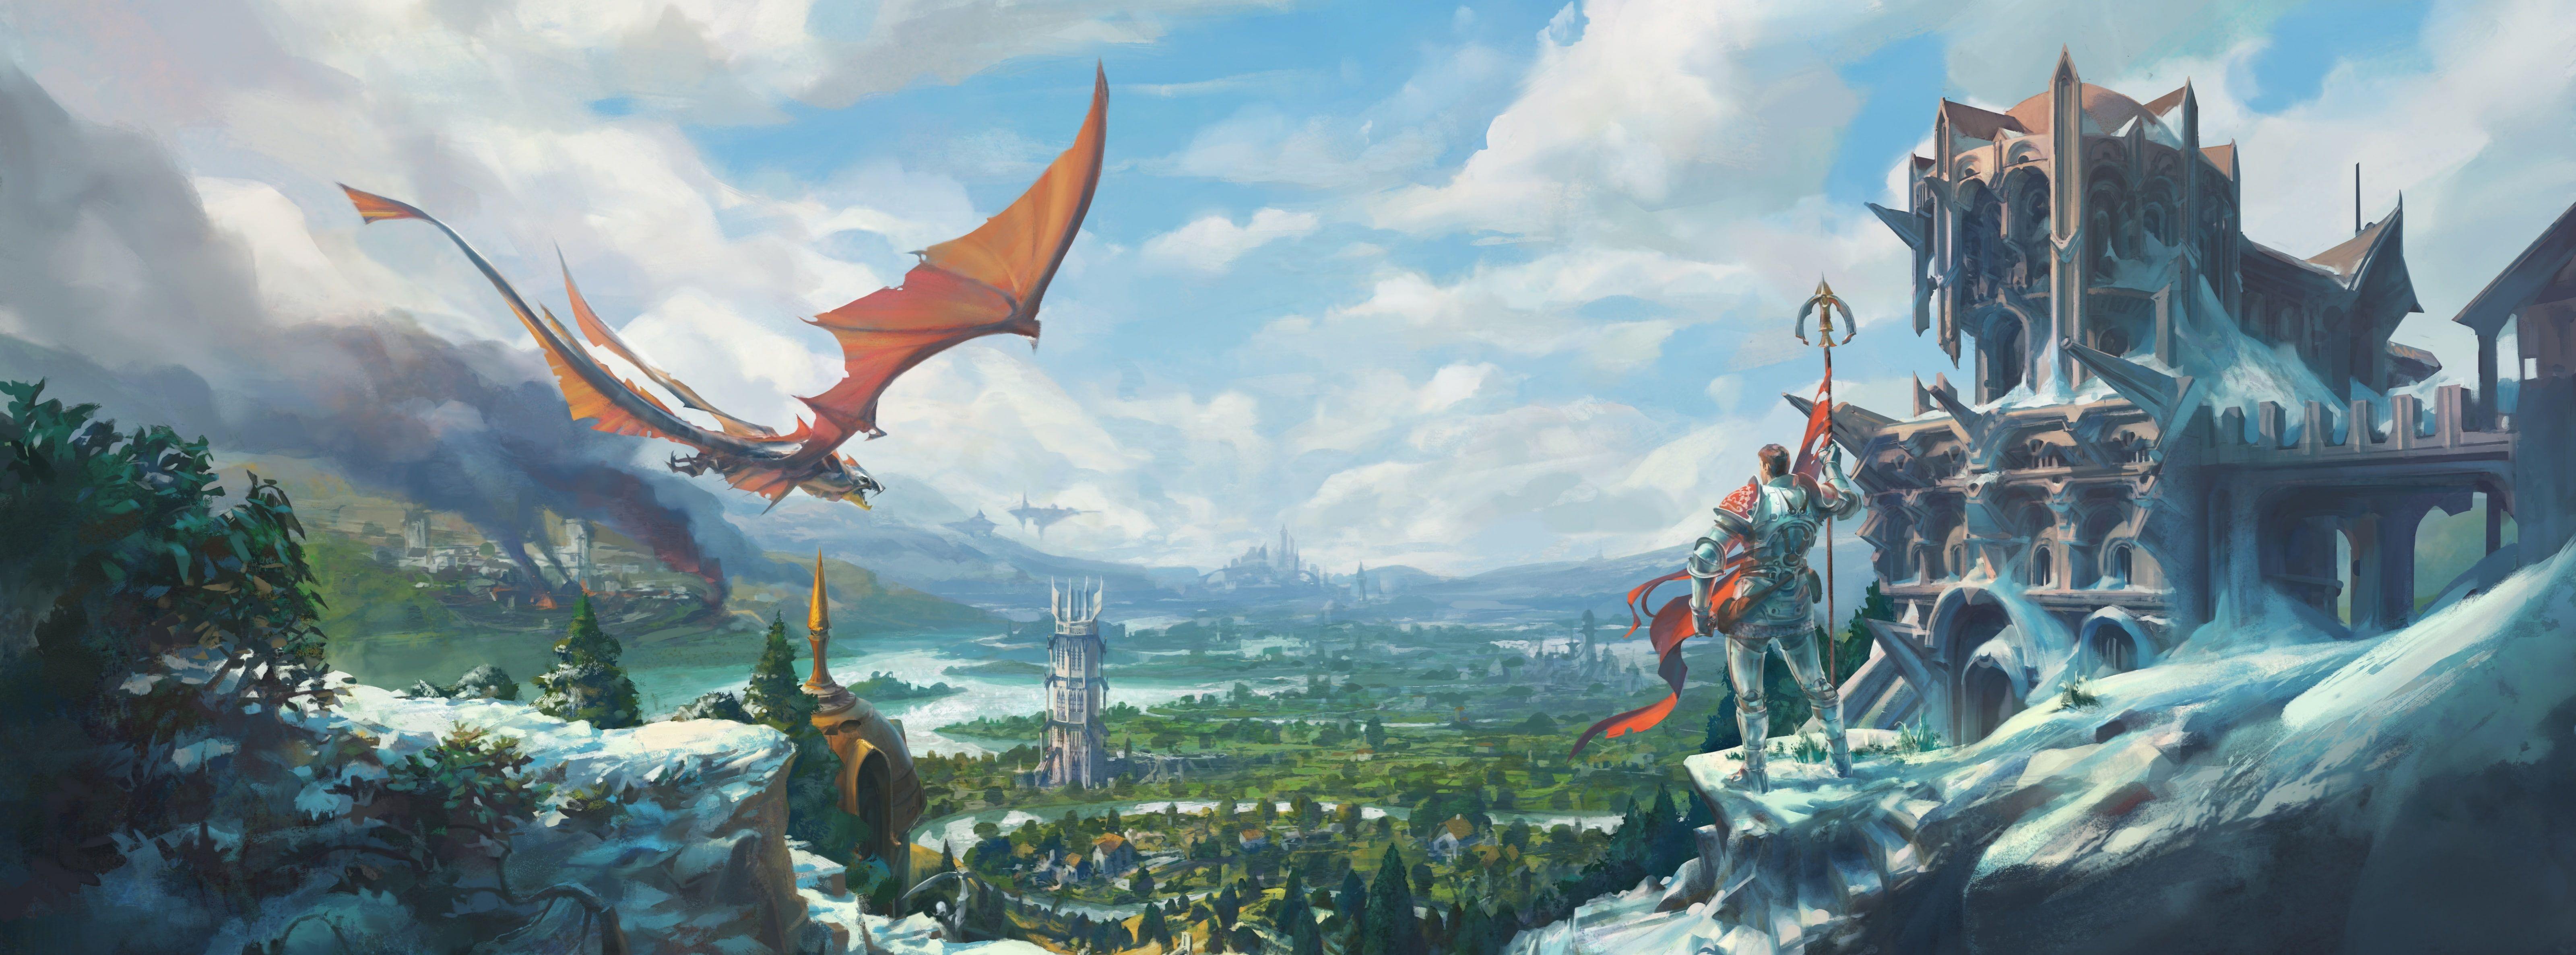 RuneScape Temple Knight Dragon game digital wallpaper Games 6400x2373